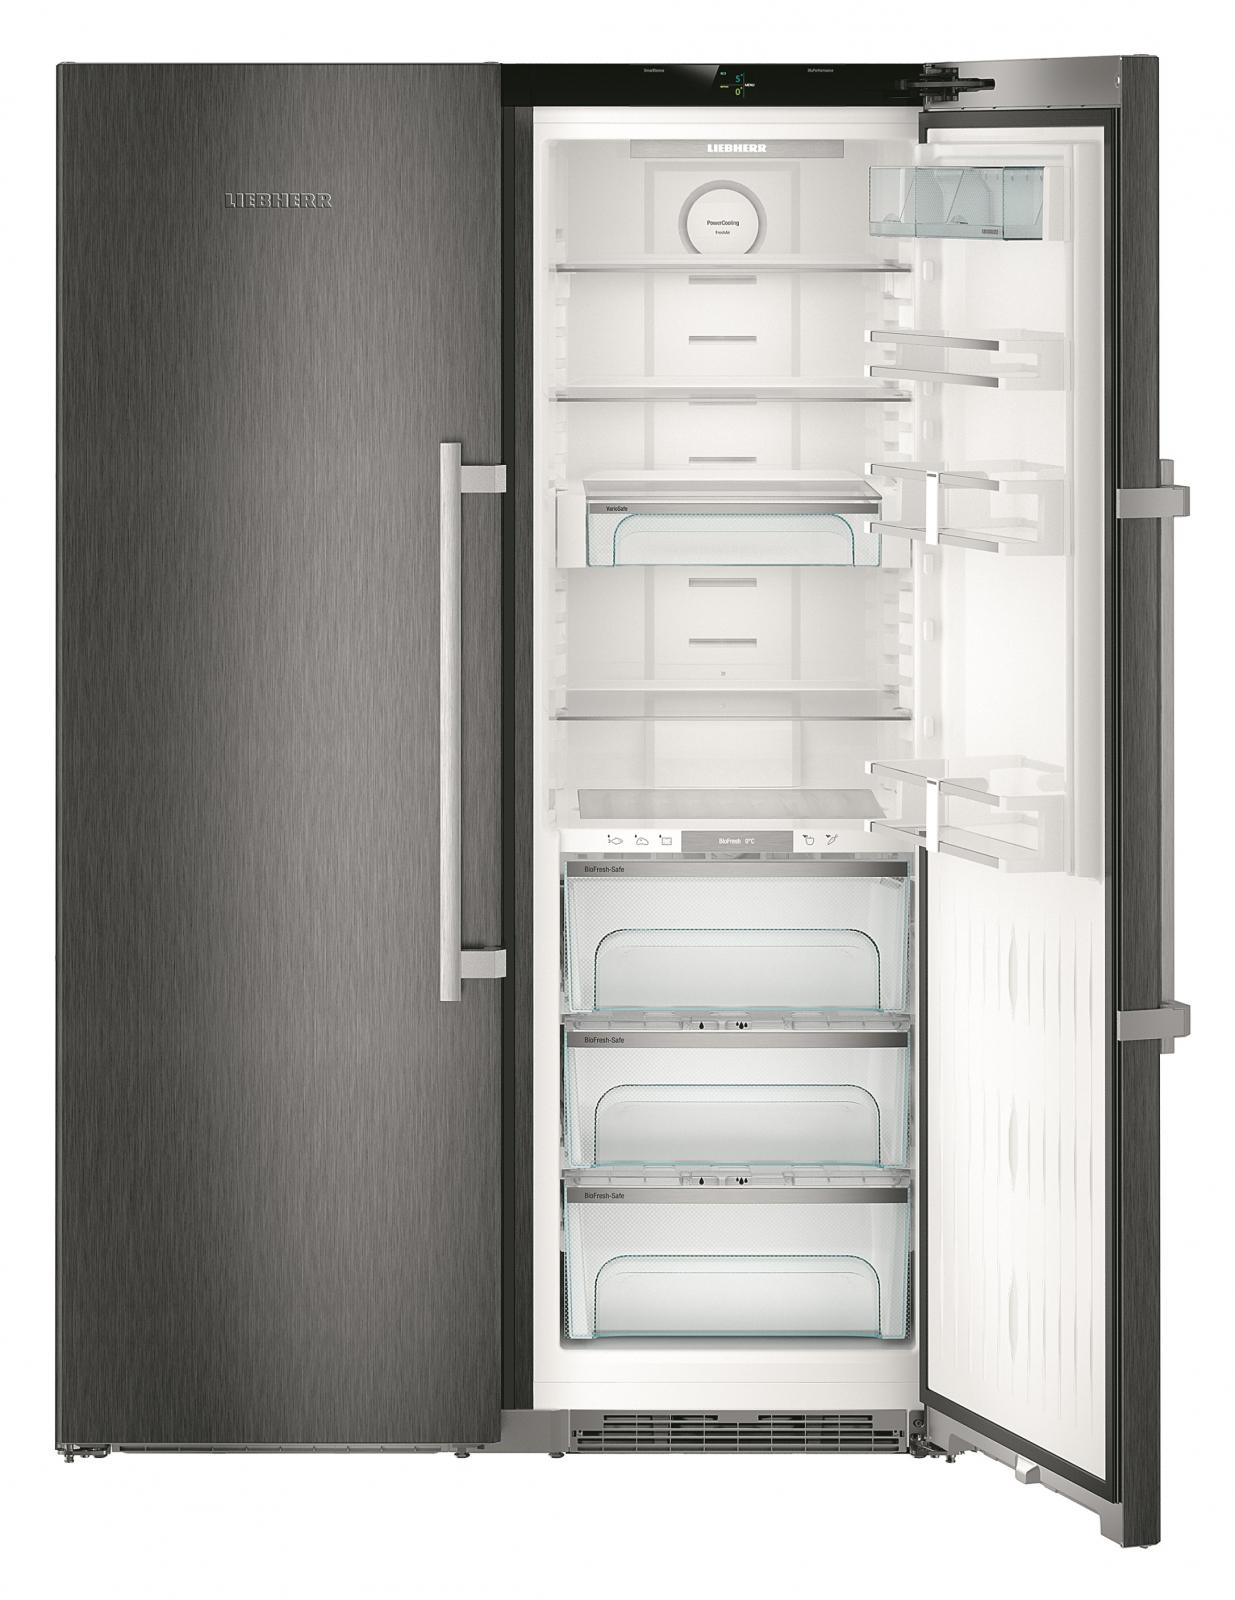 купить Side-by-Side холодильник Liebherr SBSbs 8673 Украина фото 8